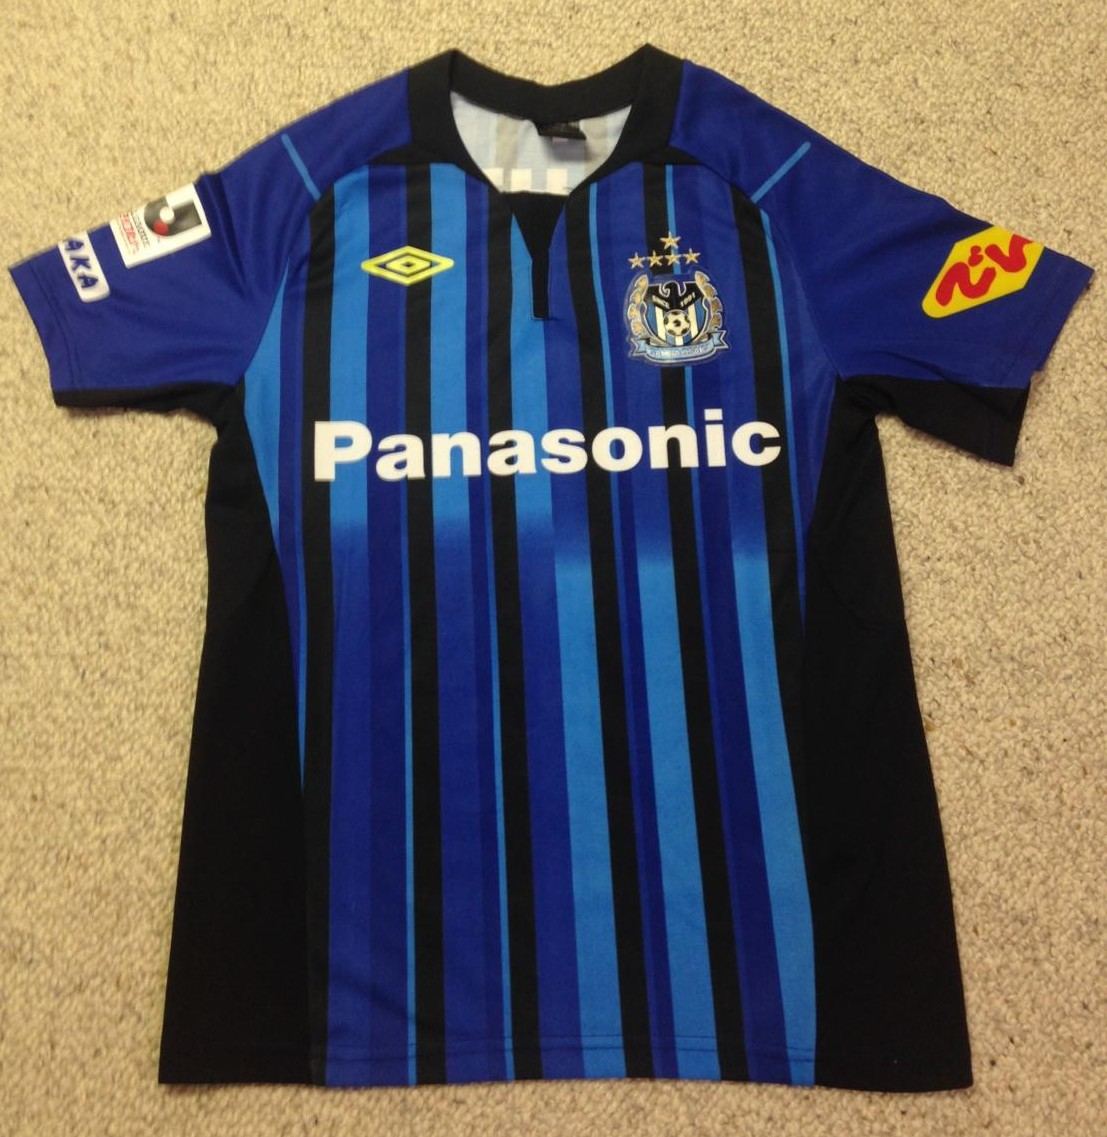 Gamba Osaka Home Football Shirt 2013 2014